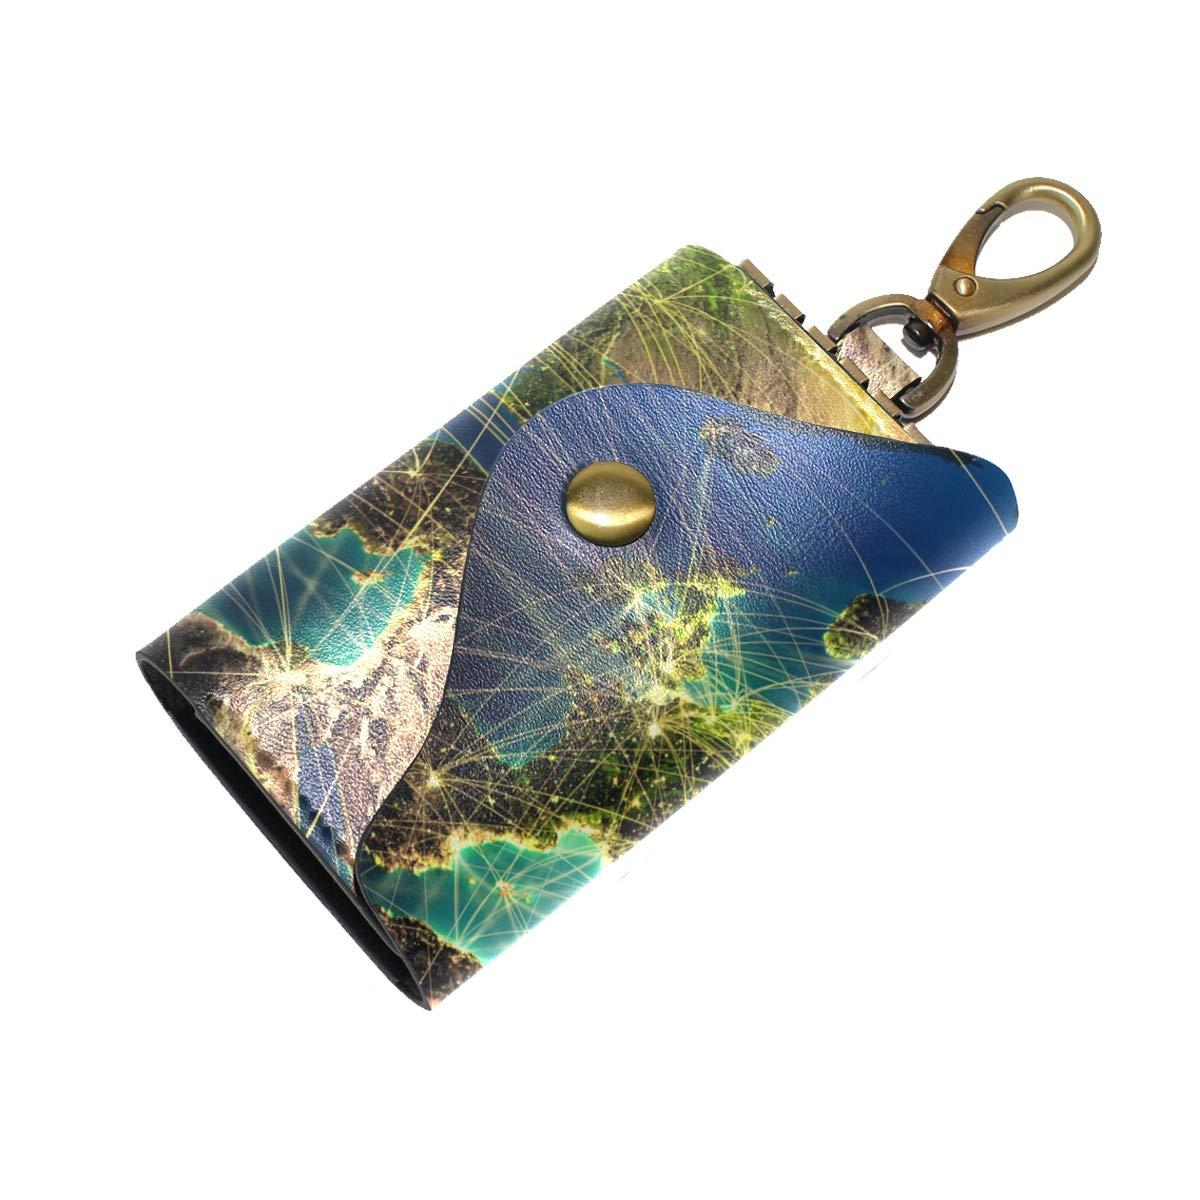 KEAKIA Earth Leather Key Case Wallets Tri-fold Key Holder Keychains with 6 Hooks 2 Slot Snap Closure for Men Women